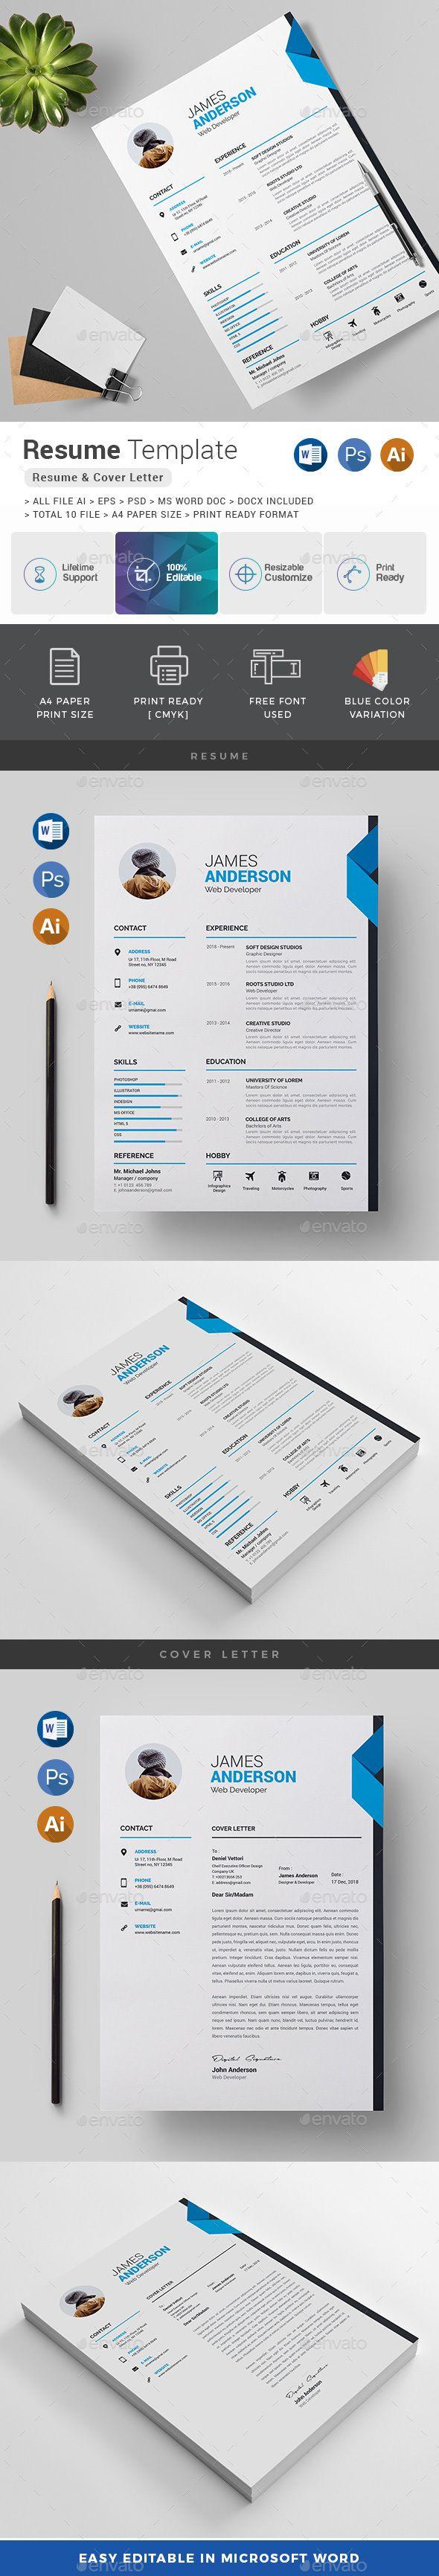 Best 25+ Resume cover letters ideas on Pinterest | Resume cover ...